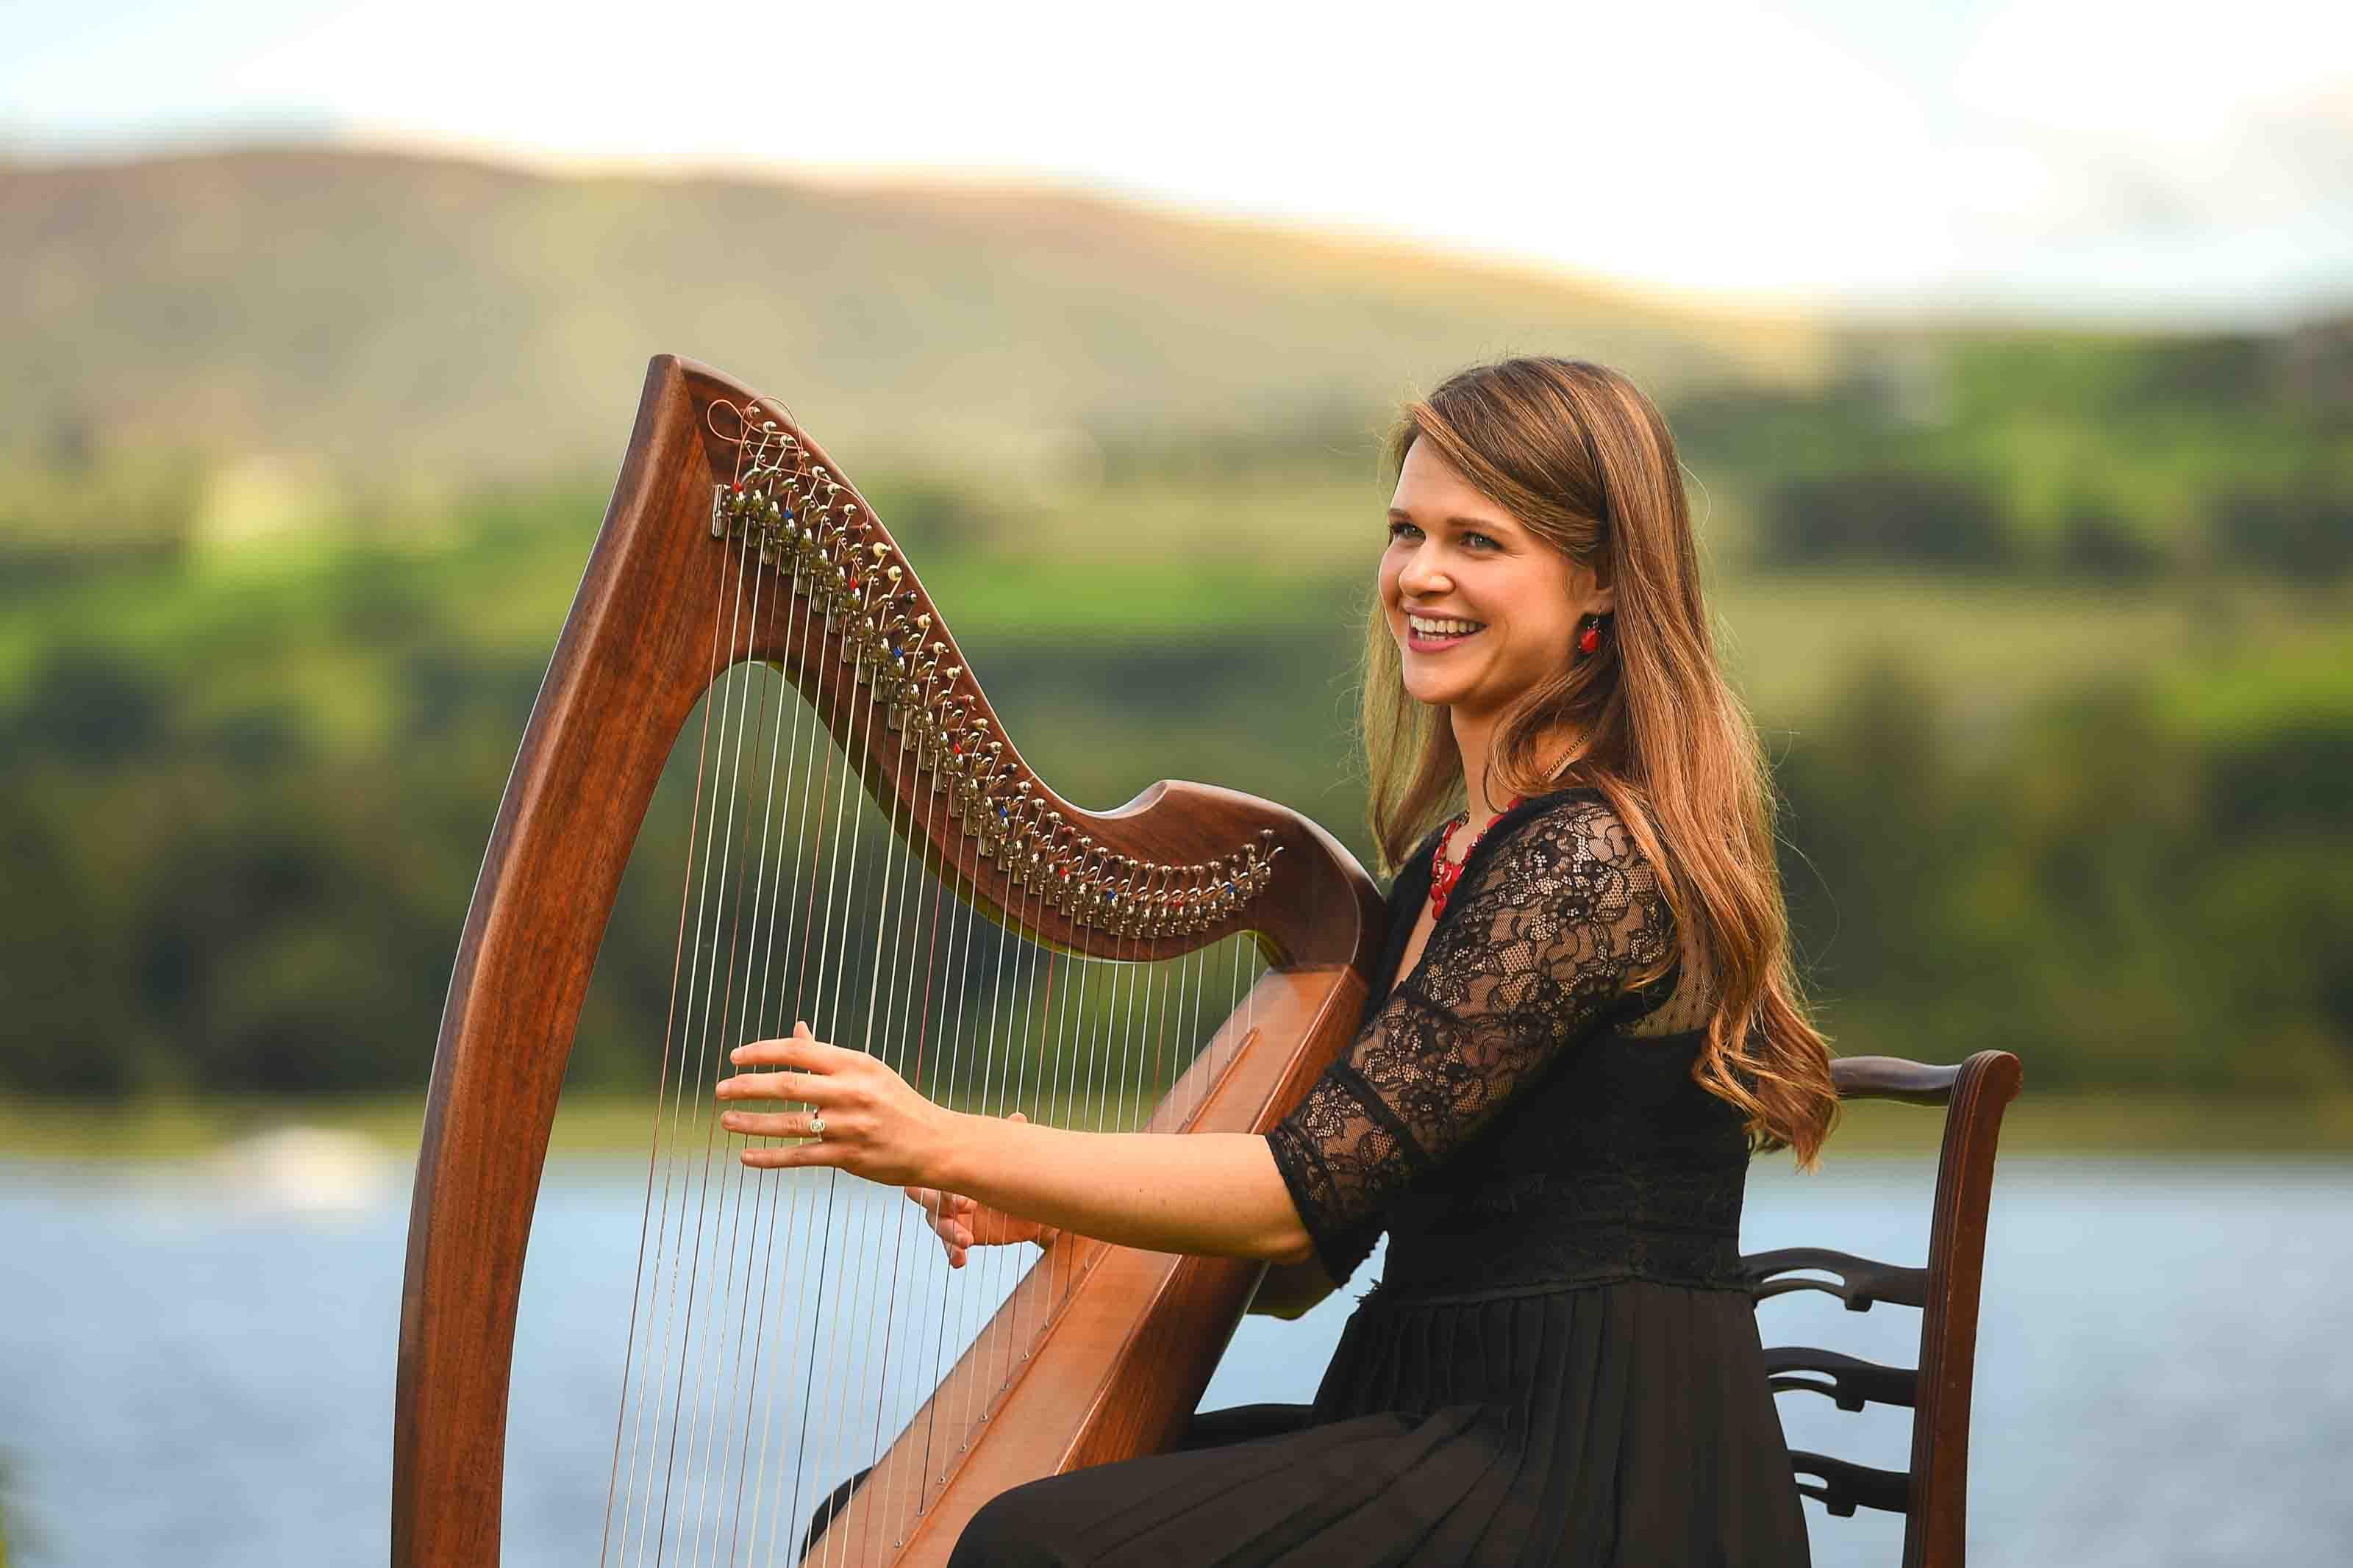 All Ireland Harpist